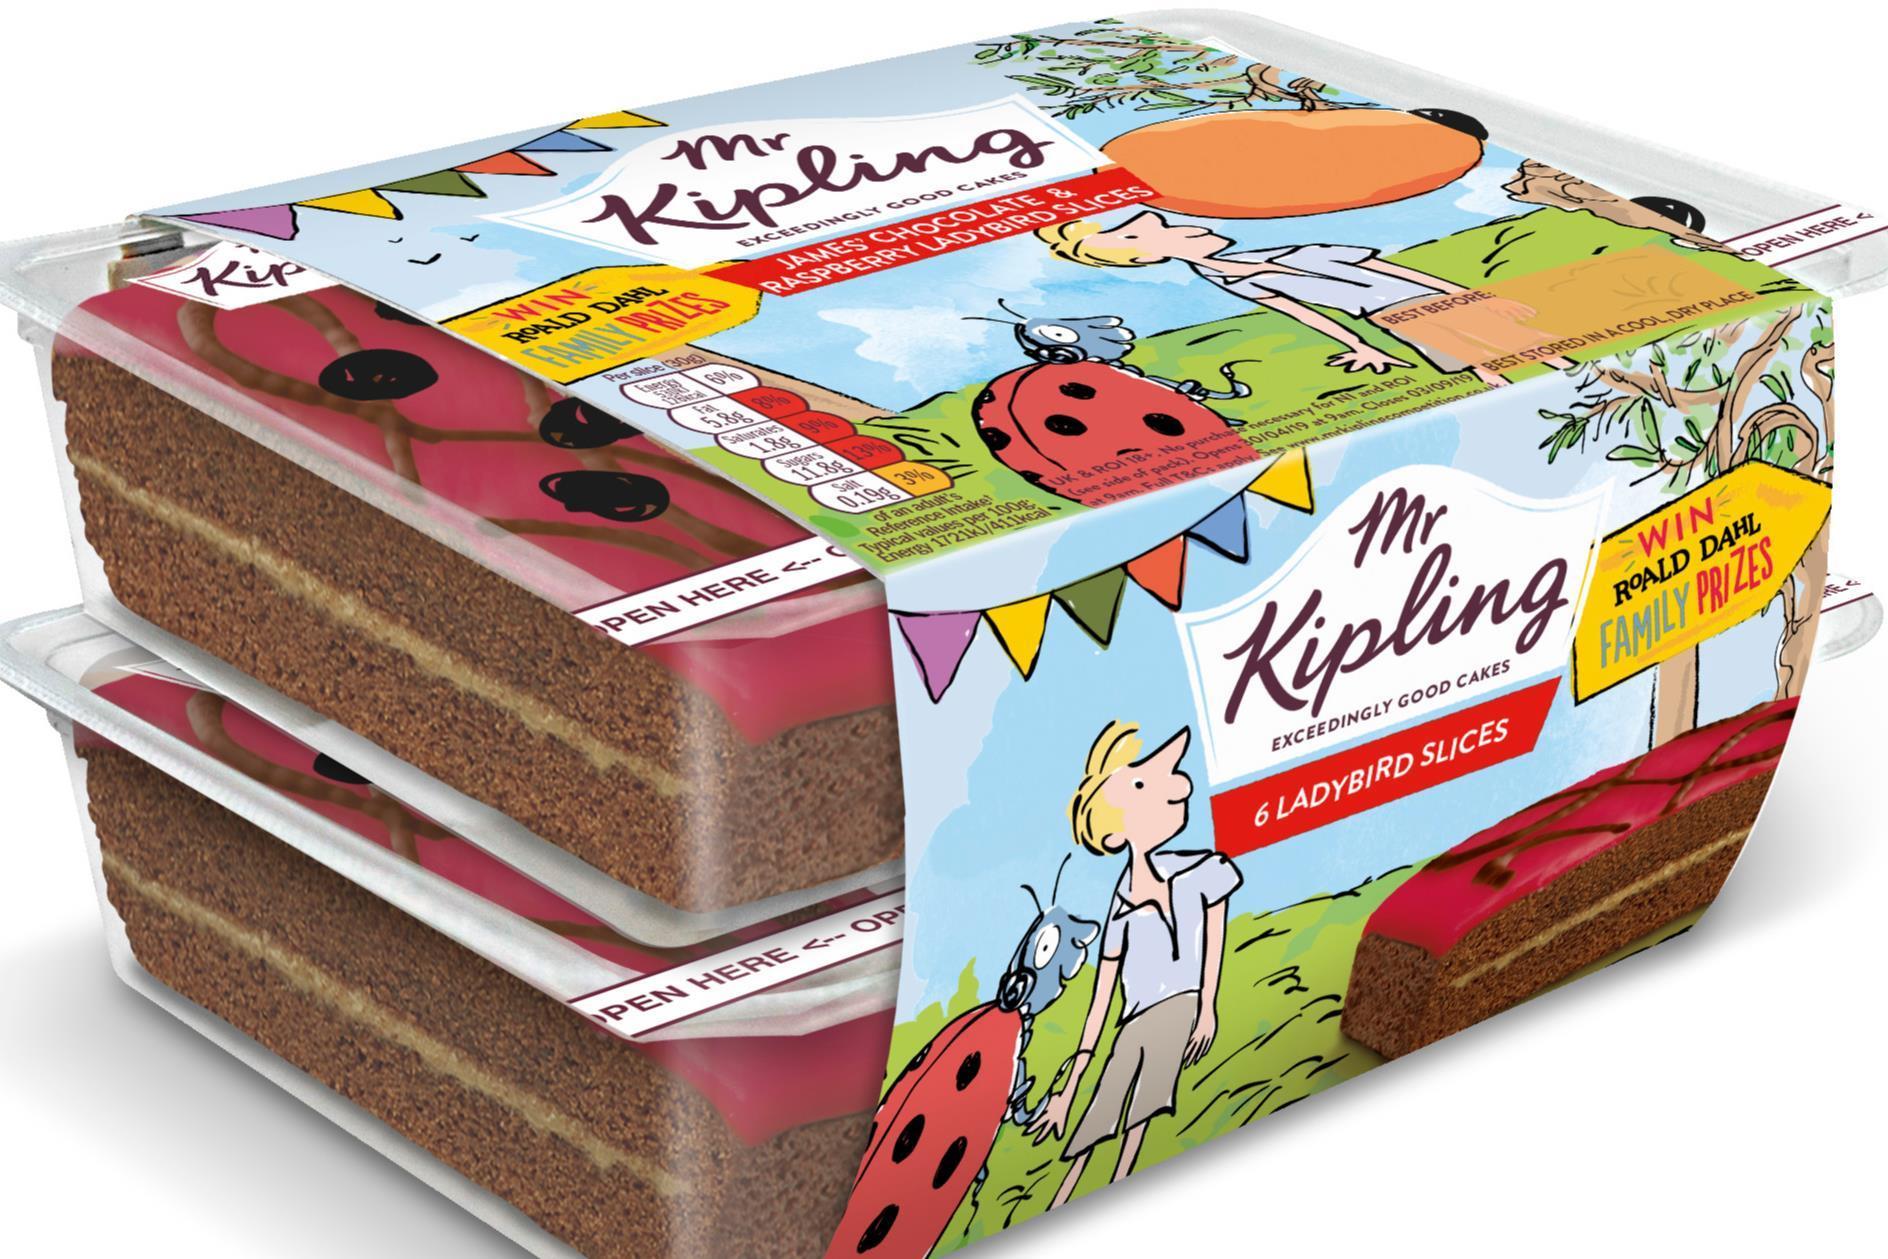 fbf624ca8a Mr Kipling brings back limited edition Roald Dahl cakes | News | The ...